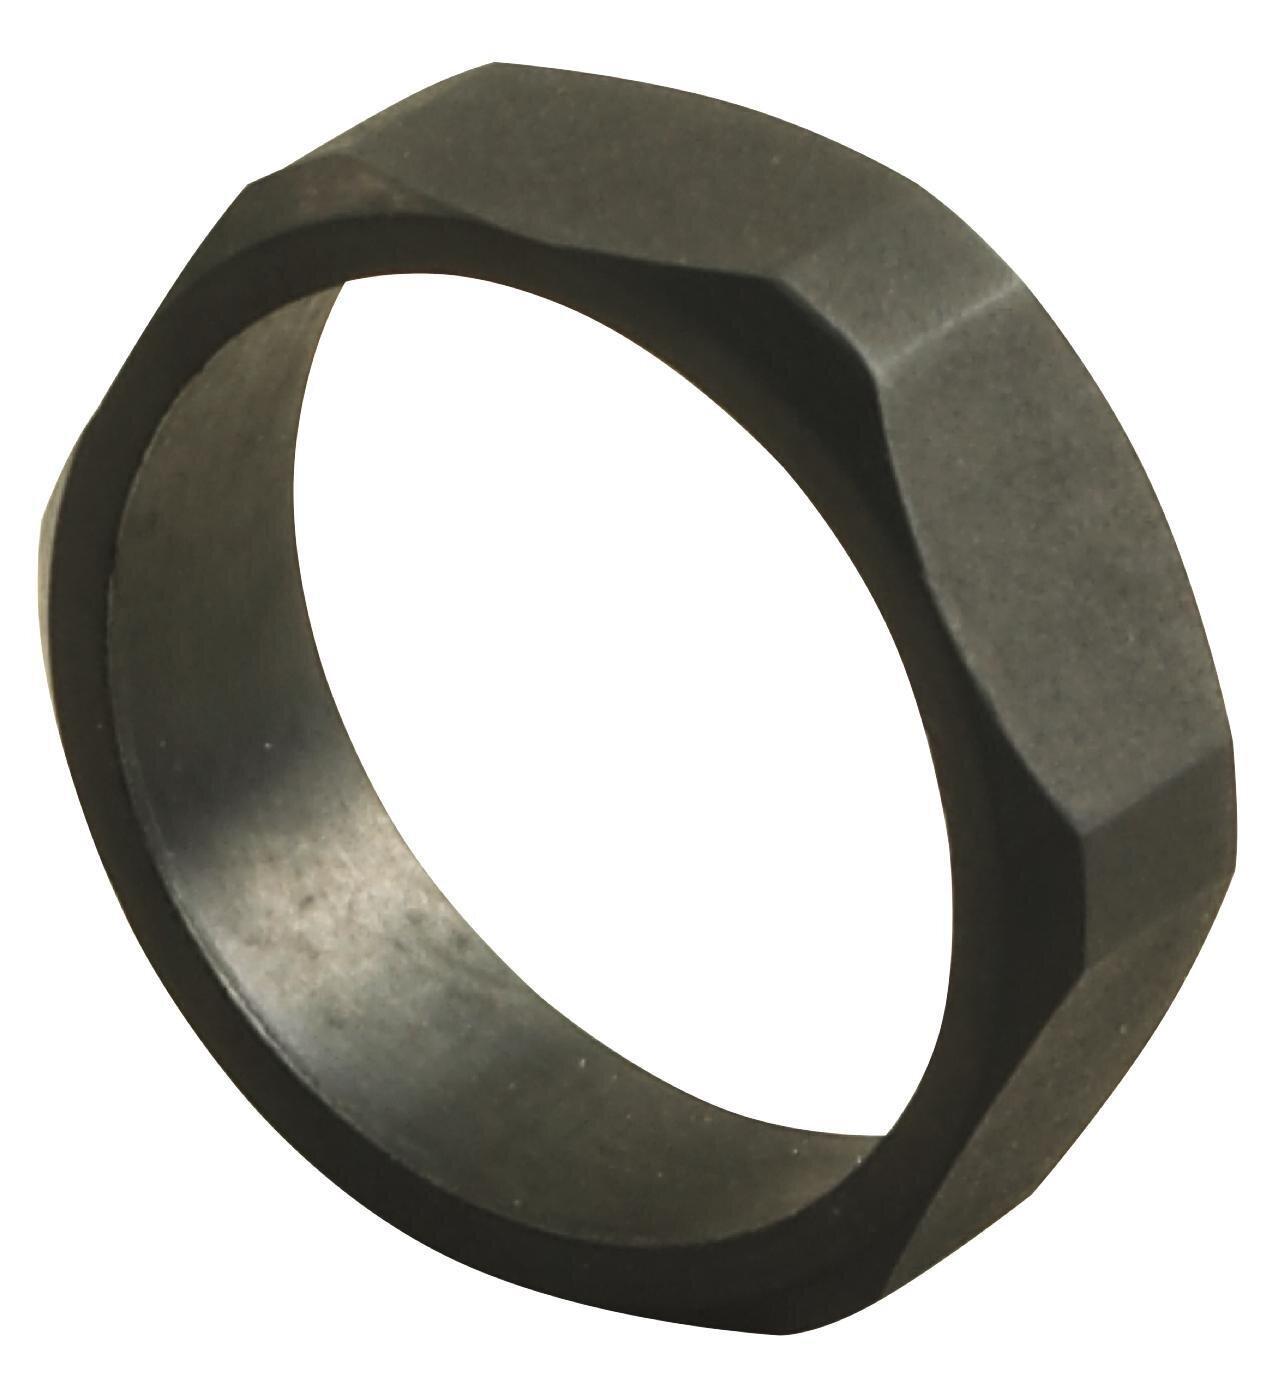 STL75702 - Anti-Roll Sleeve